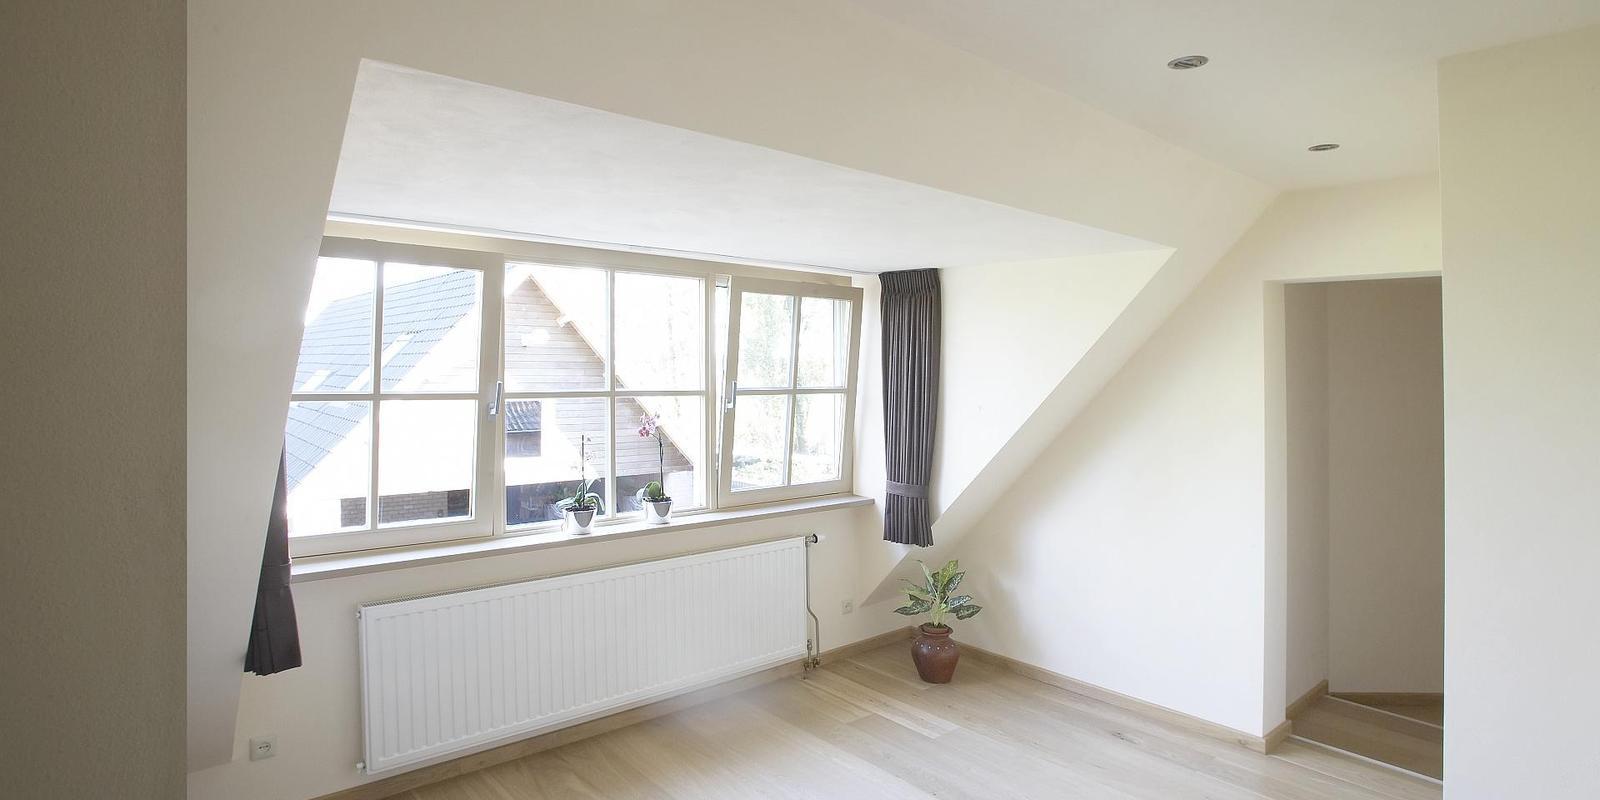 binnenkant dakkapel schilderen